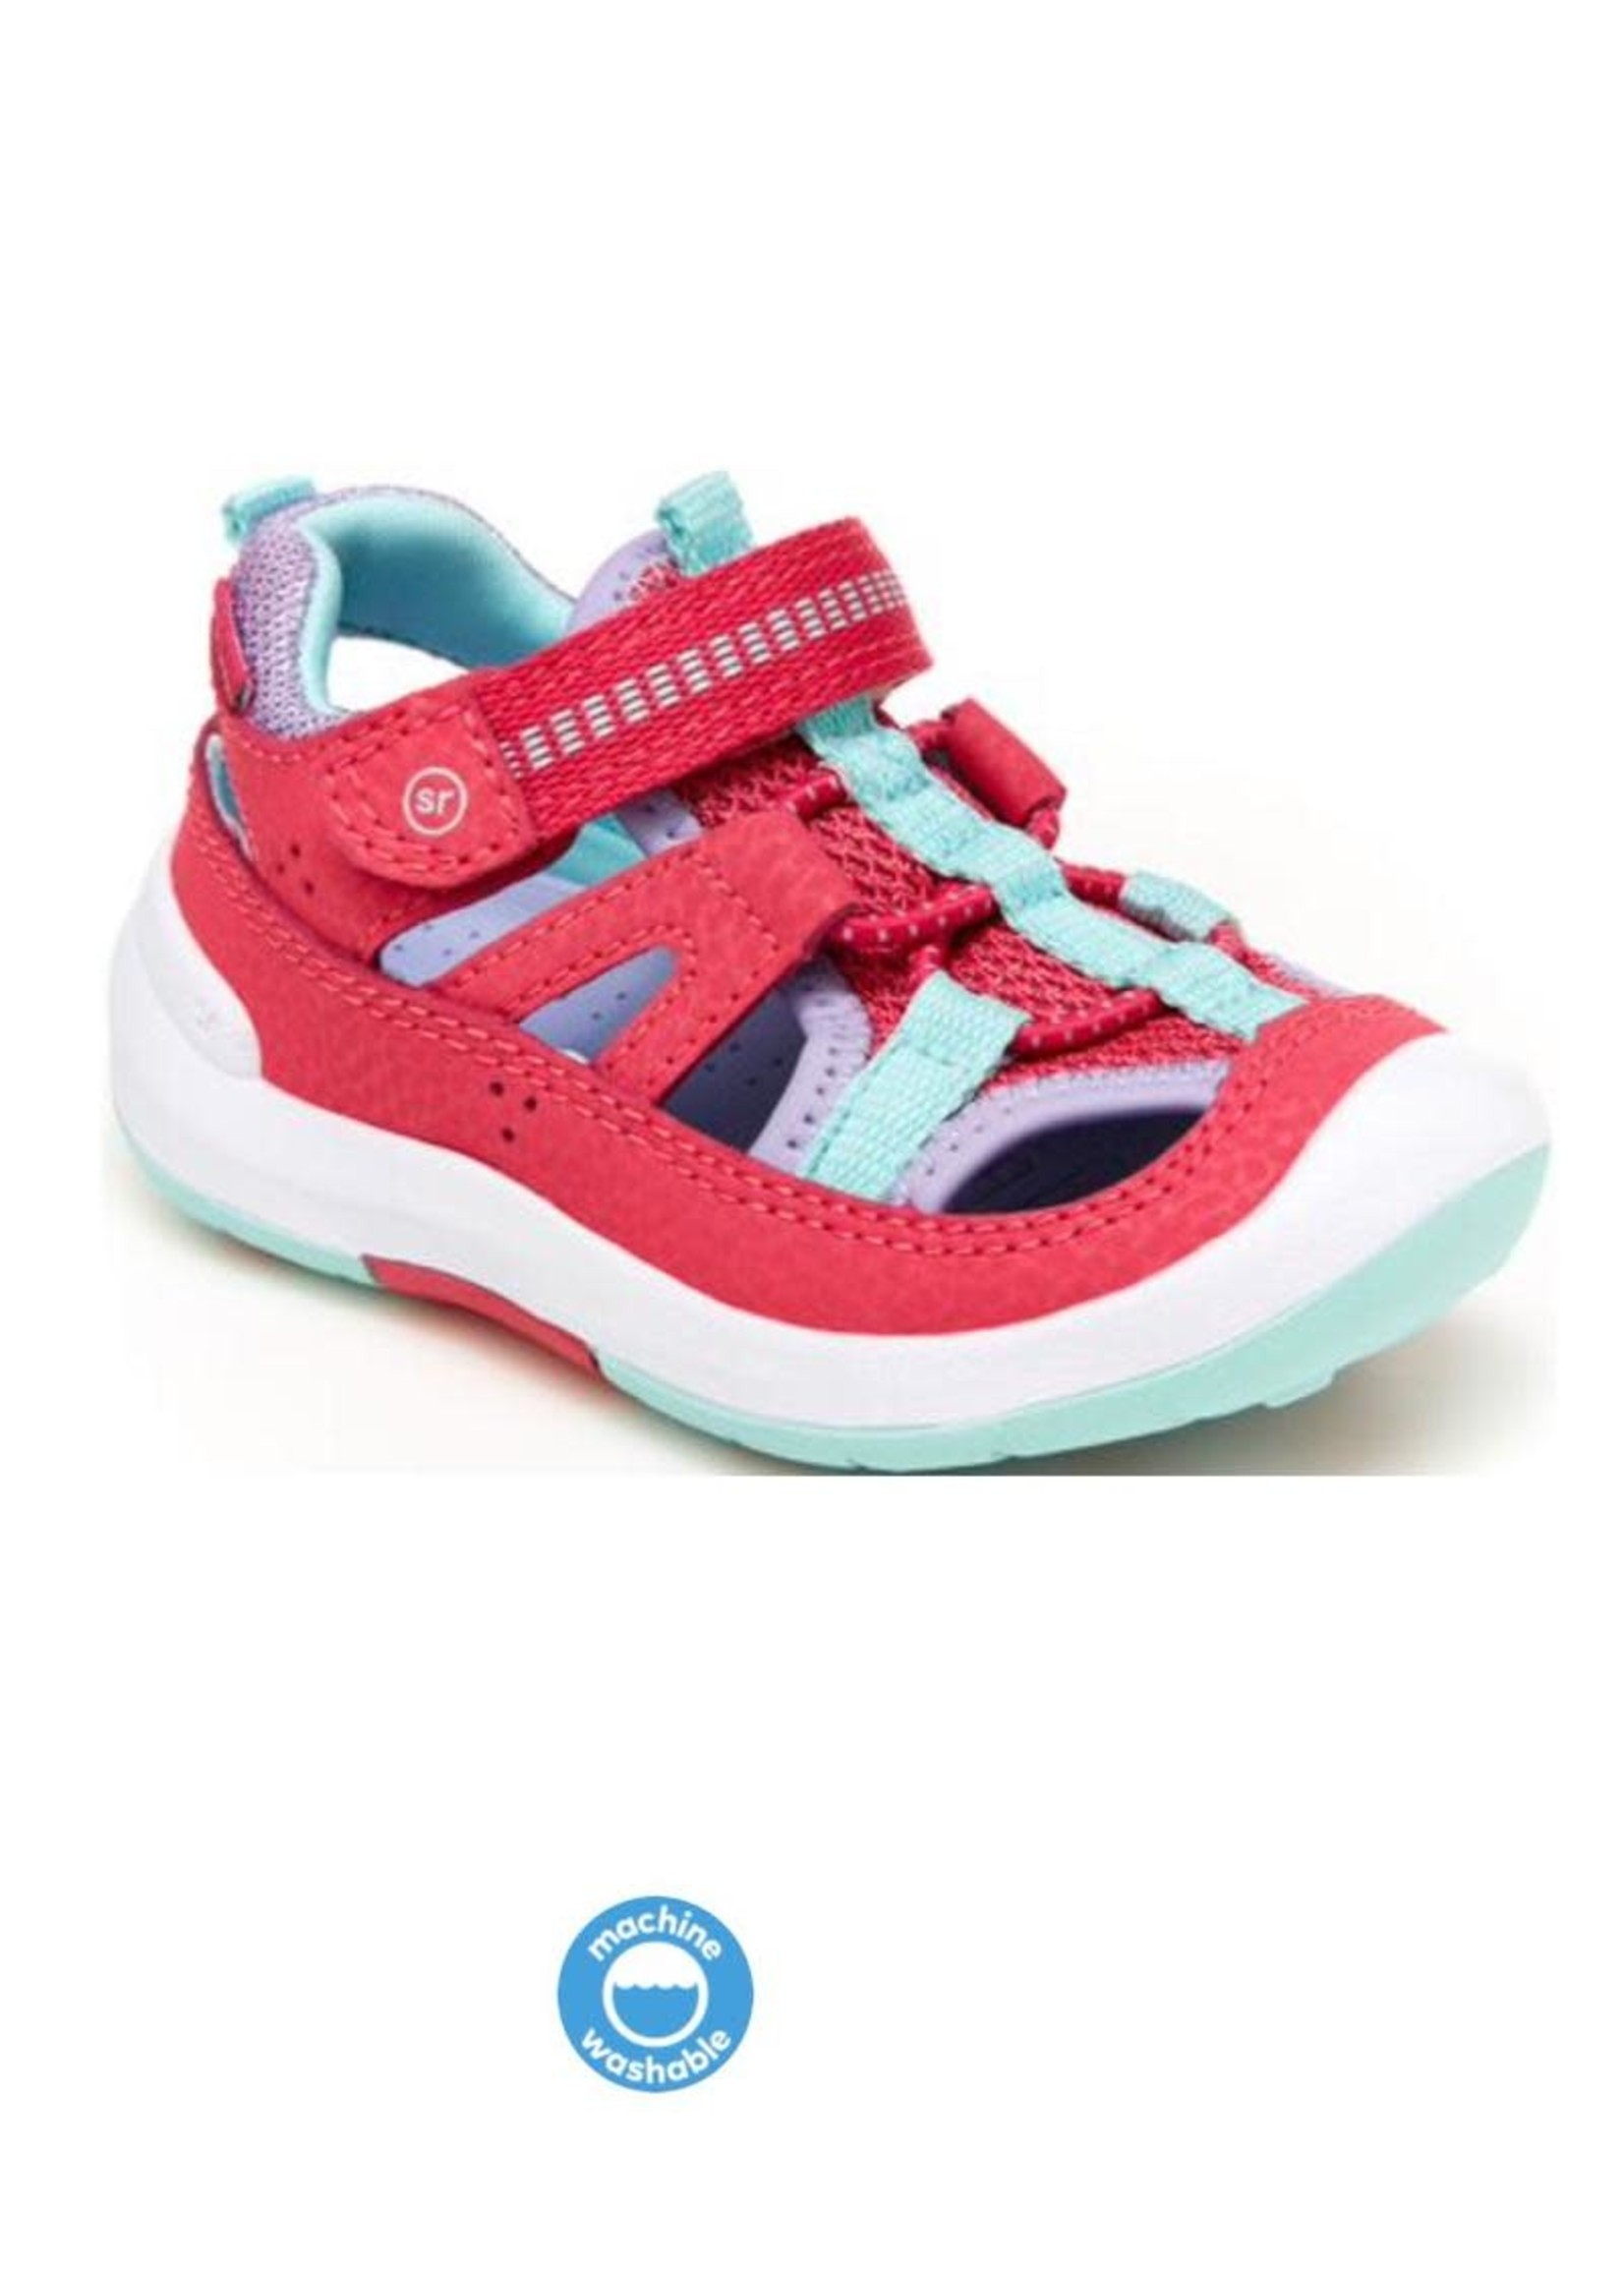 Striderite Stride Rite, Pink SRTech Wade Sneaker Sandal